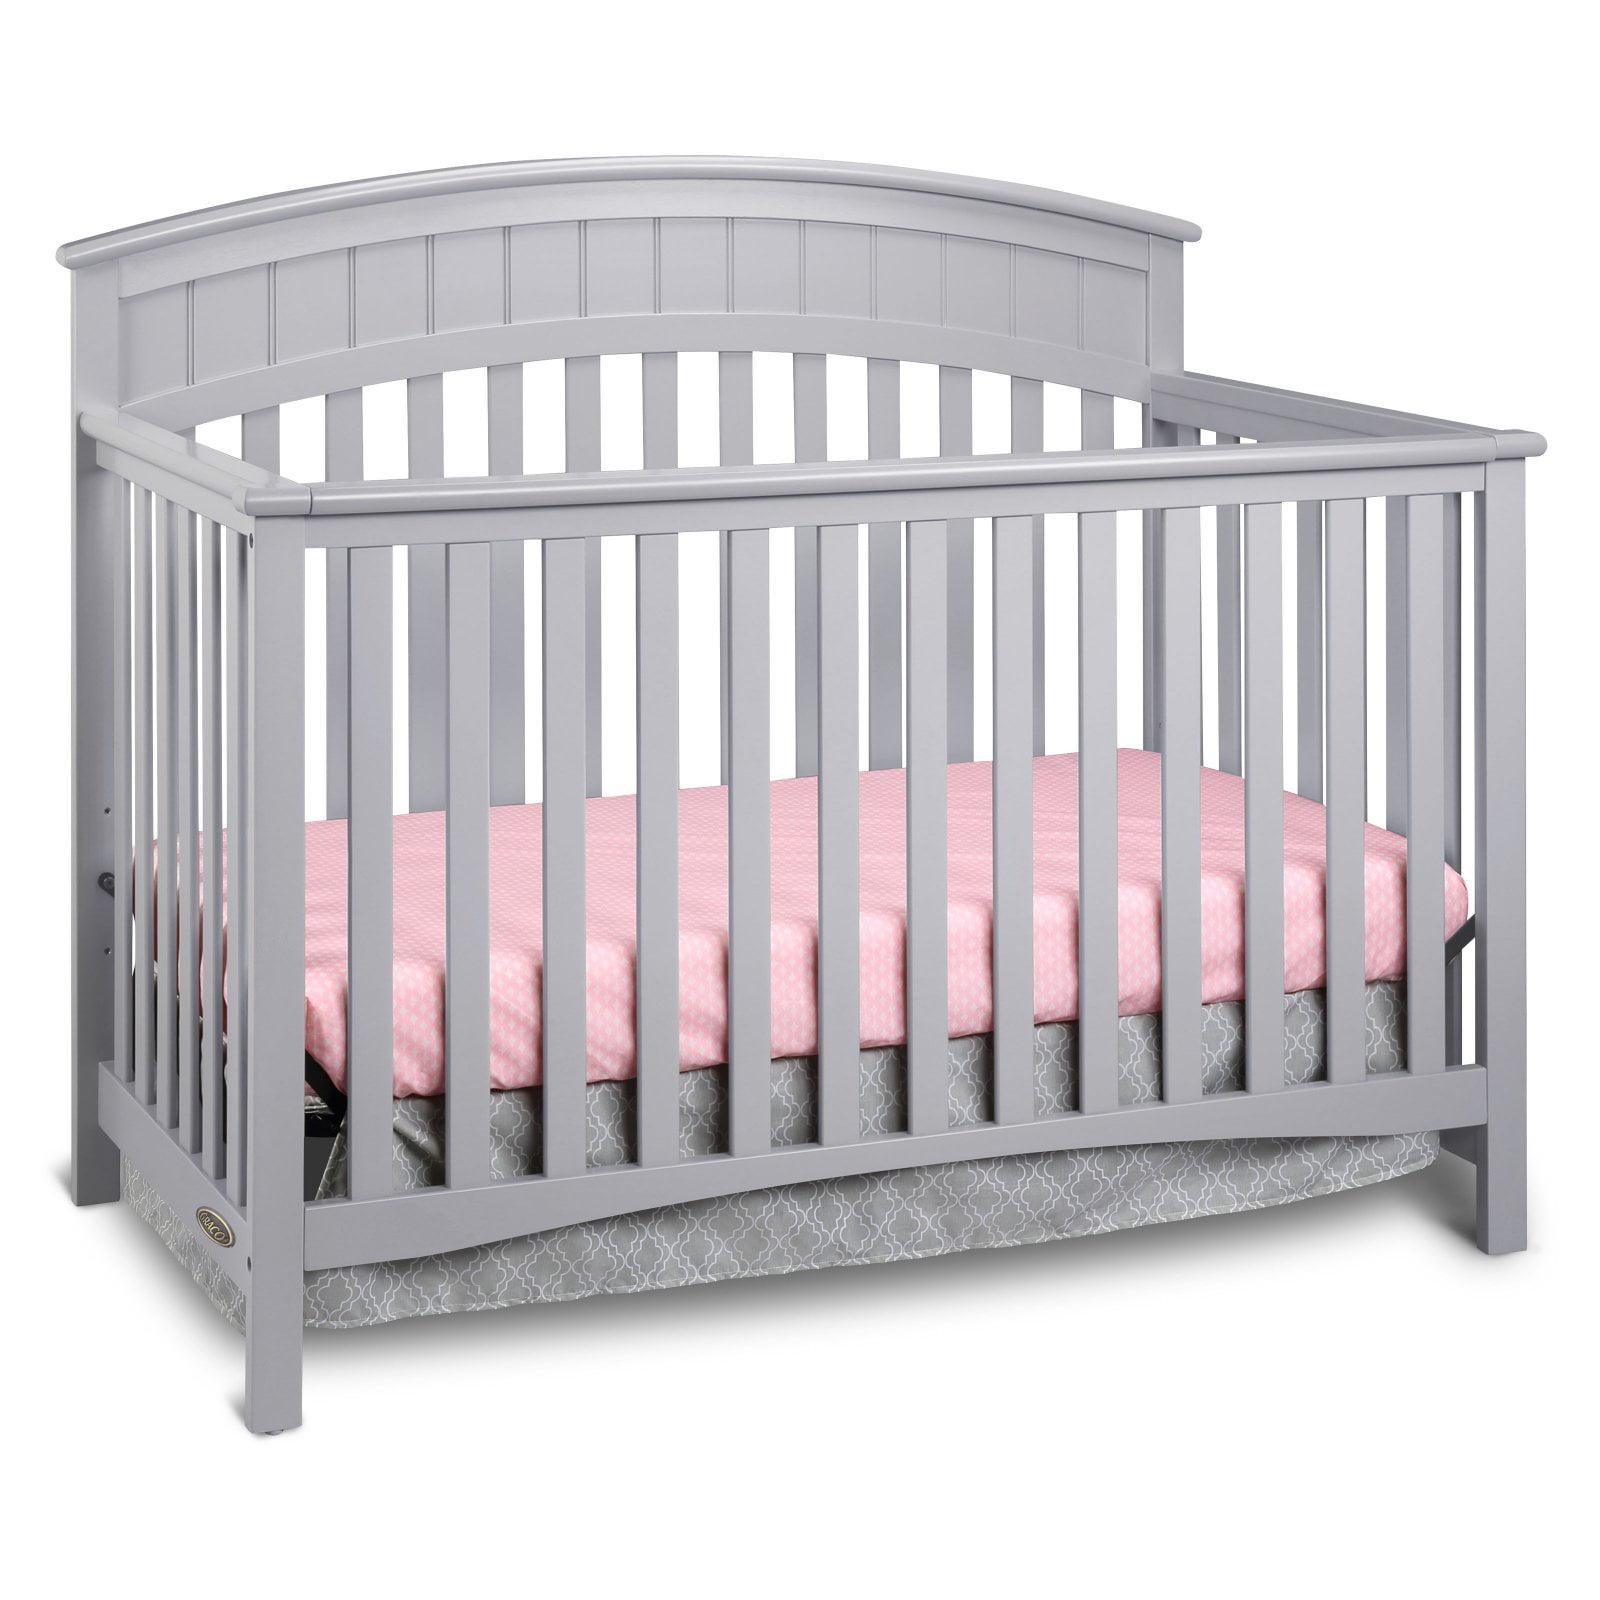 Graco Charleston 4 in 1 Convertible Baby Crib, Pebble Gray ...